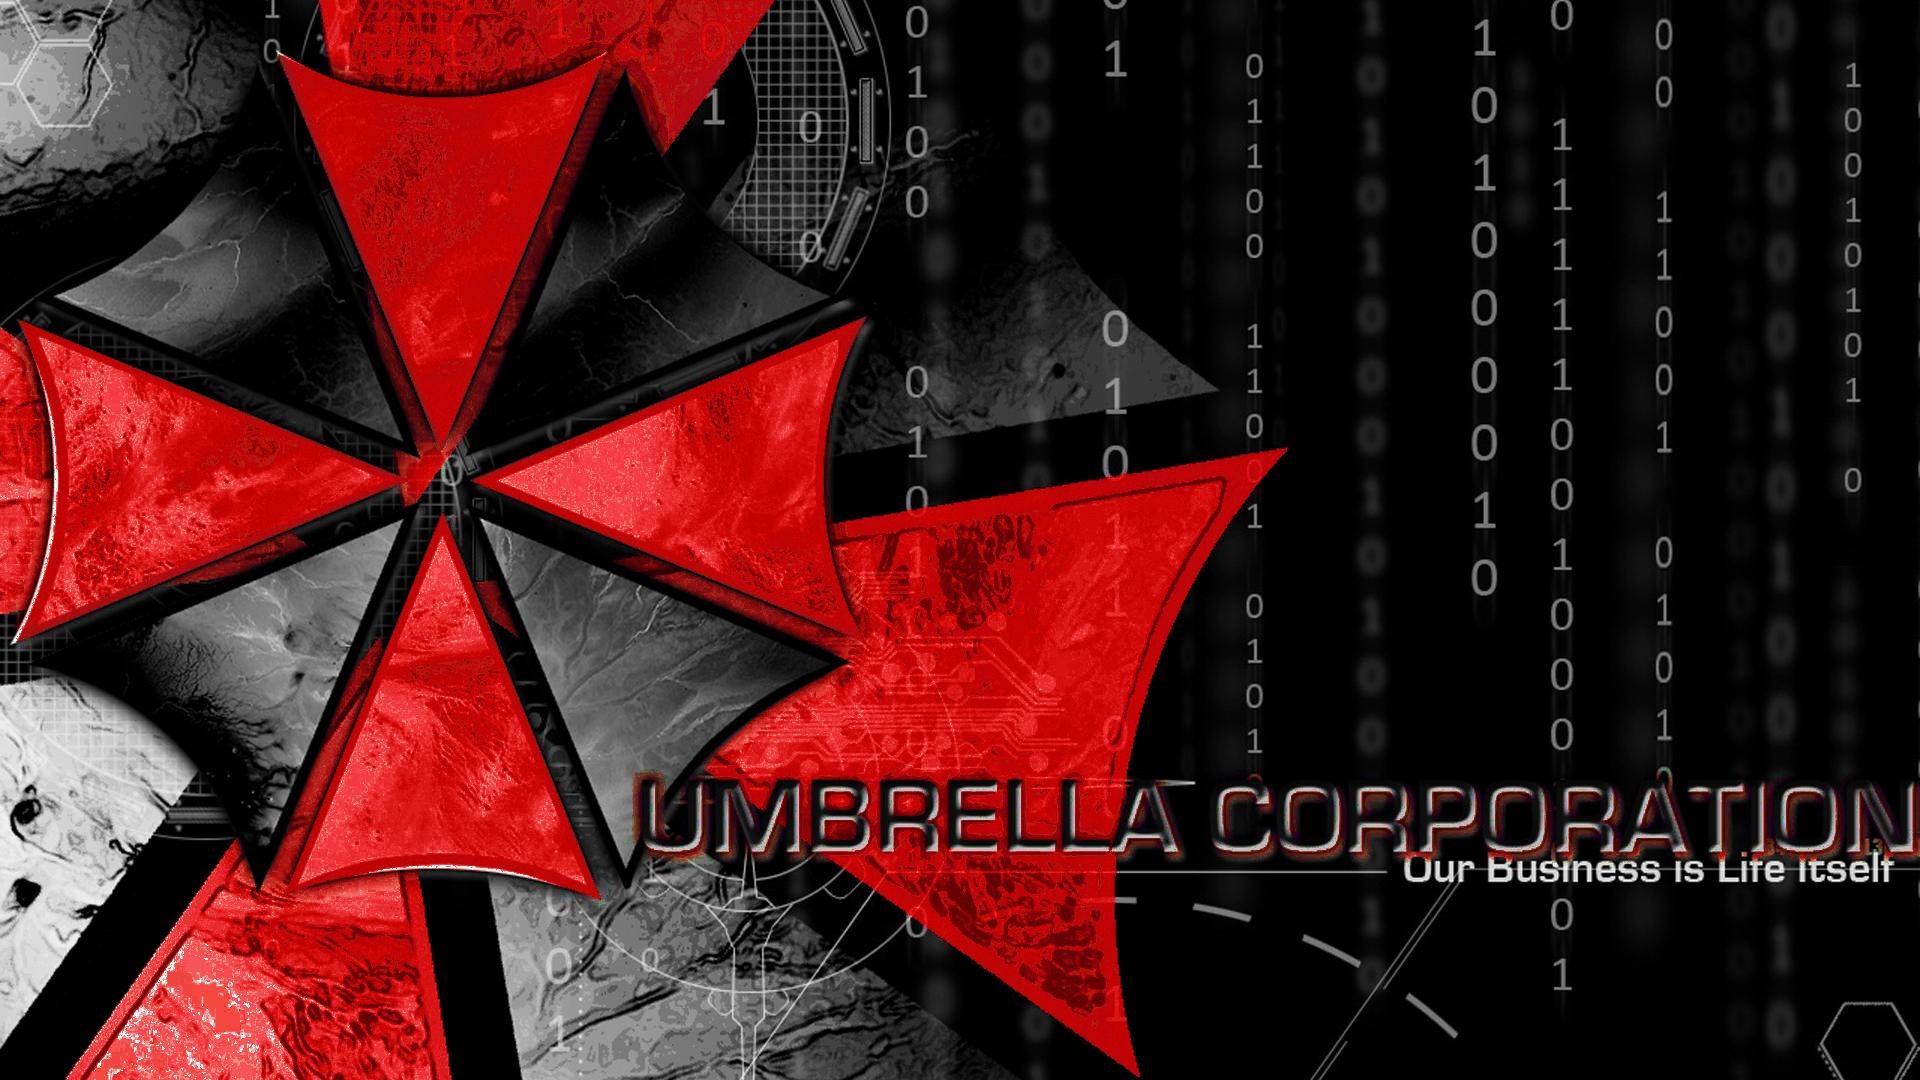 Umbrella Corporation Wallpaper 1080p Resident Evil Full HD ...